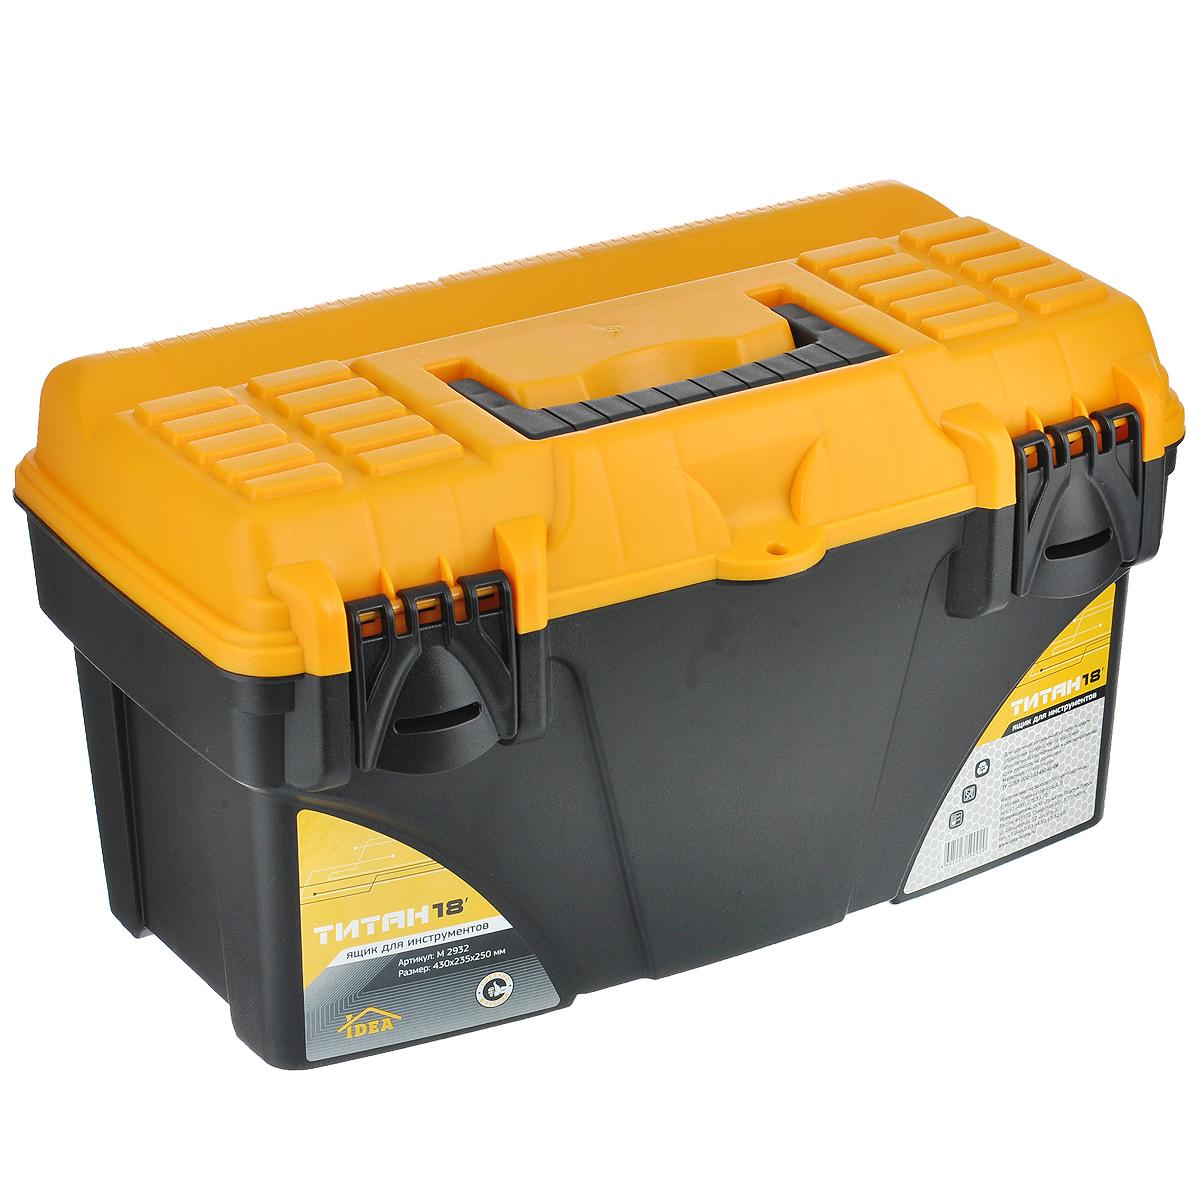 "Idea (М-пластика) Ящик для инструментов Idea ""Титан 18"", 43 x 23,5 x 25 см"